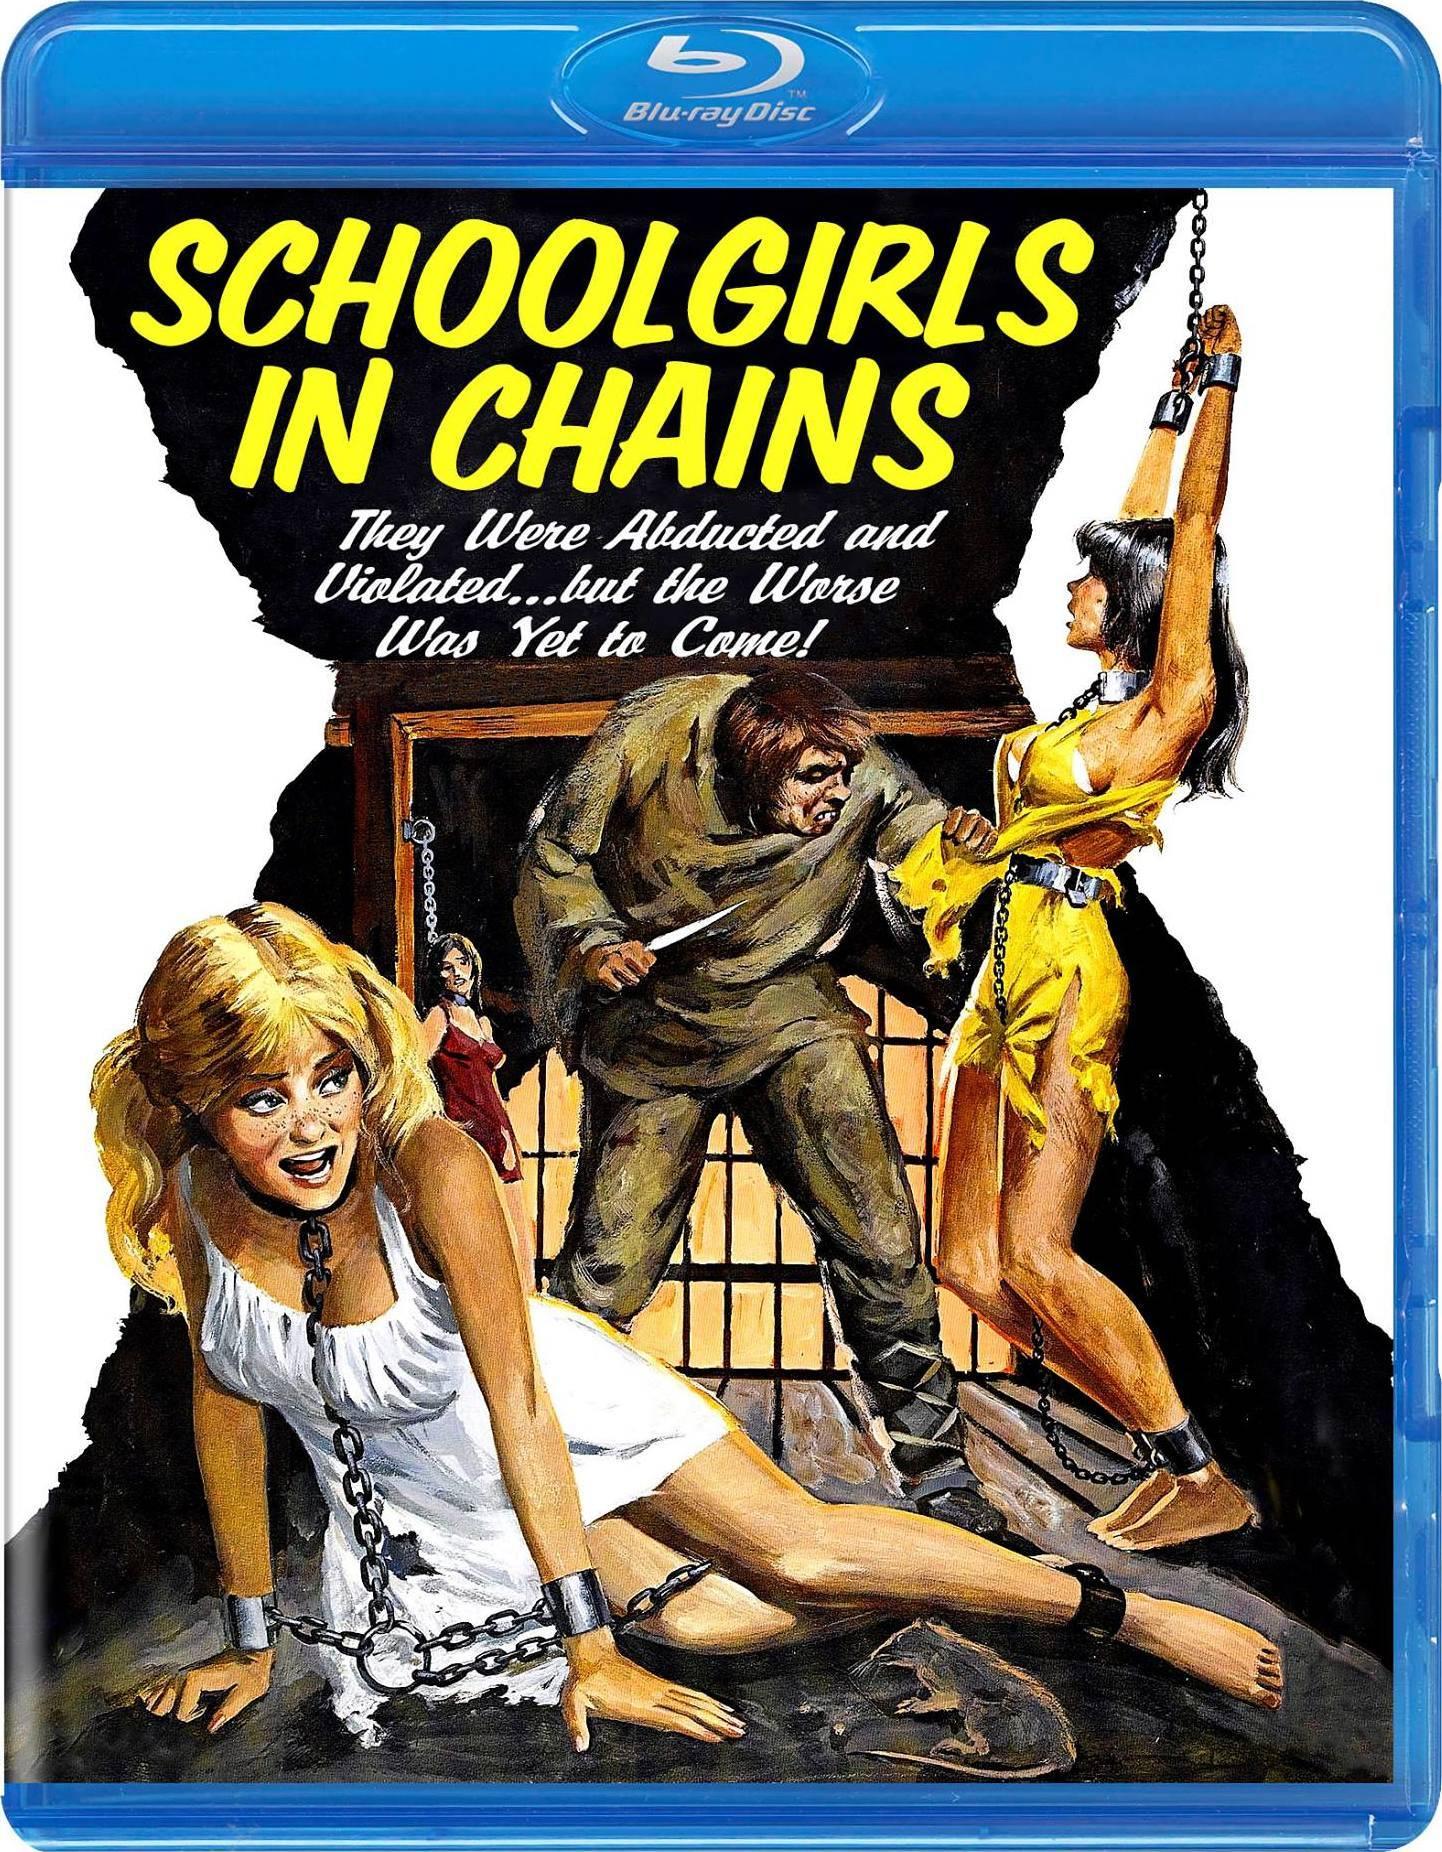 Schoolgirls in Chains (1973) [w/Commentaries]